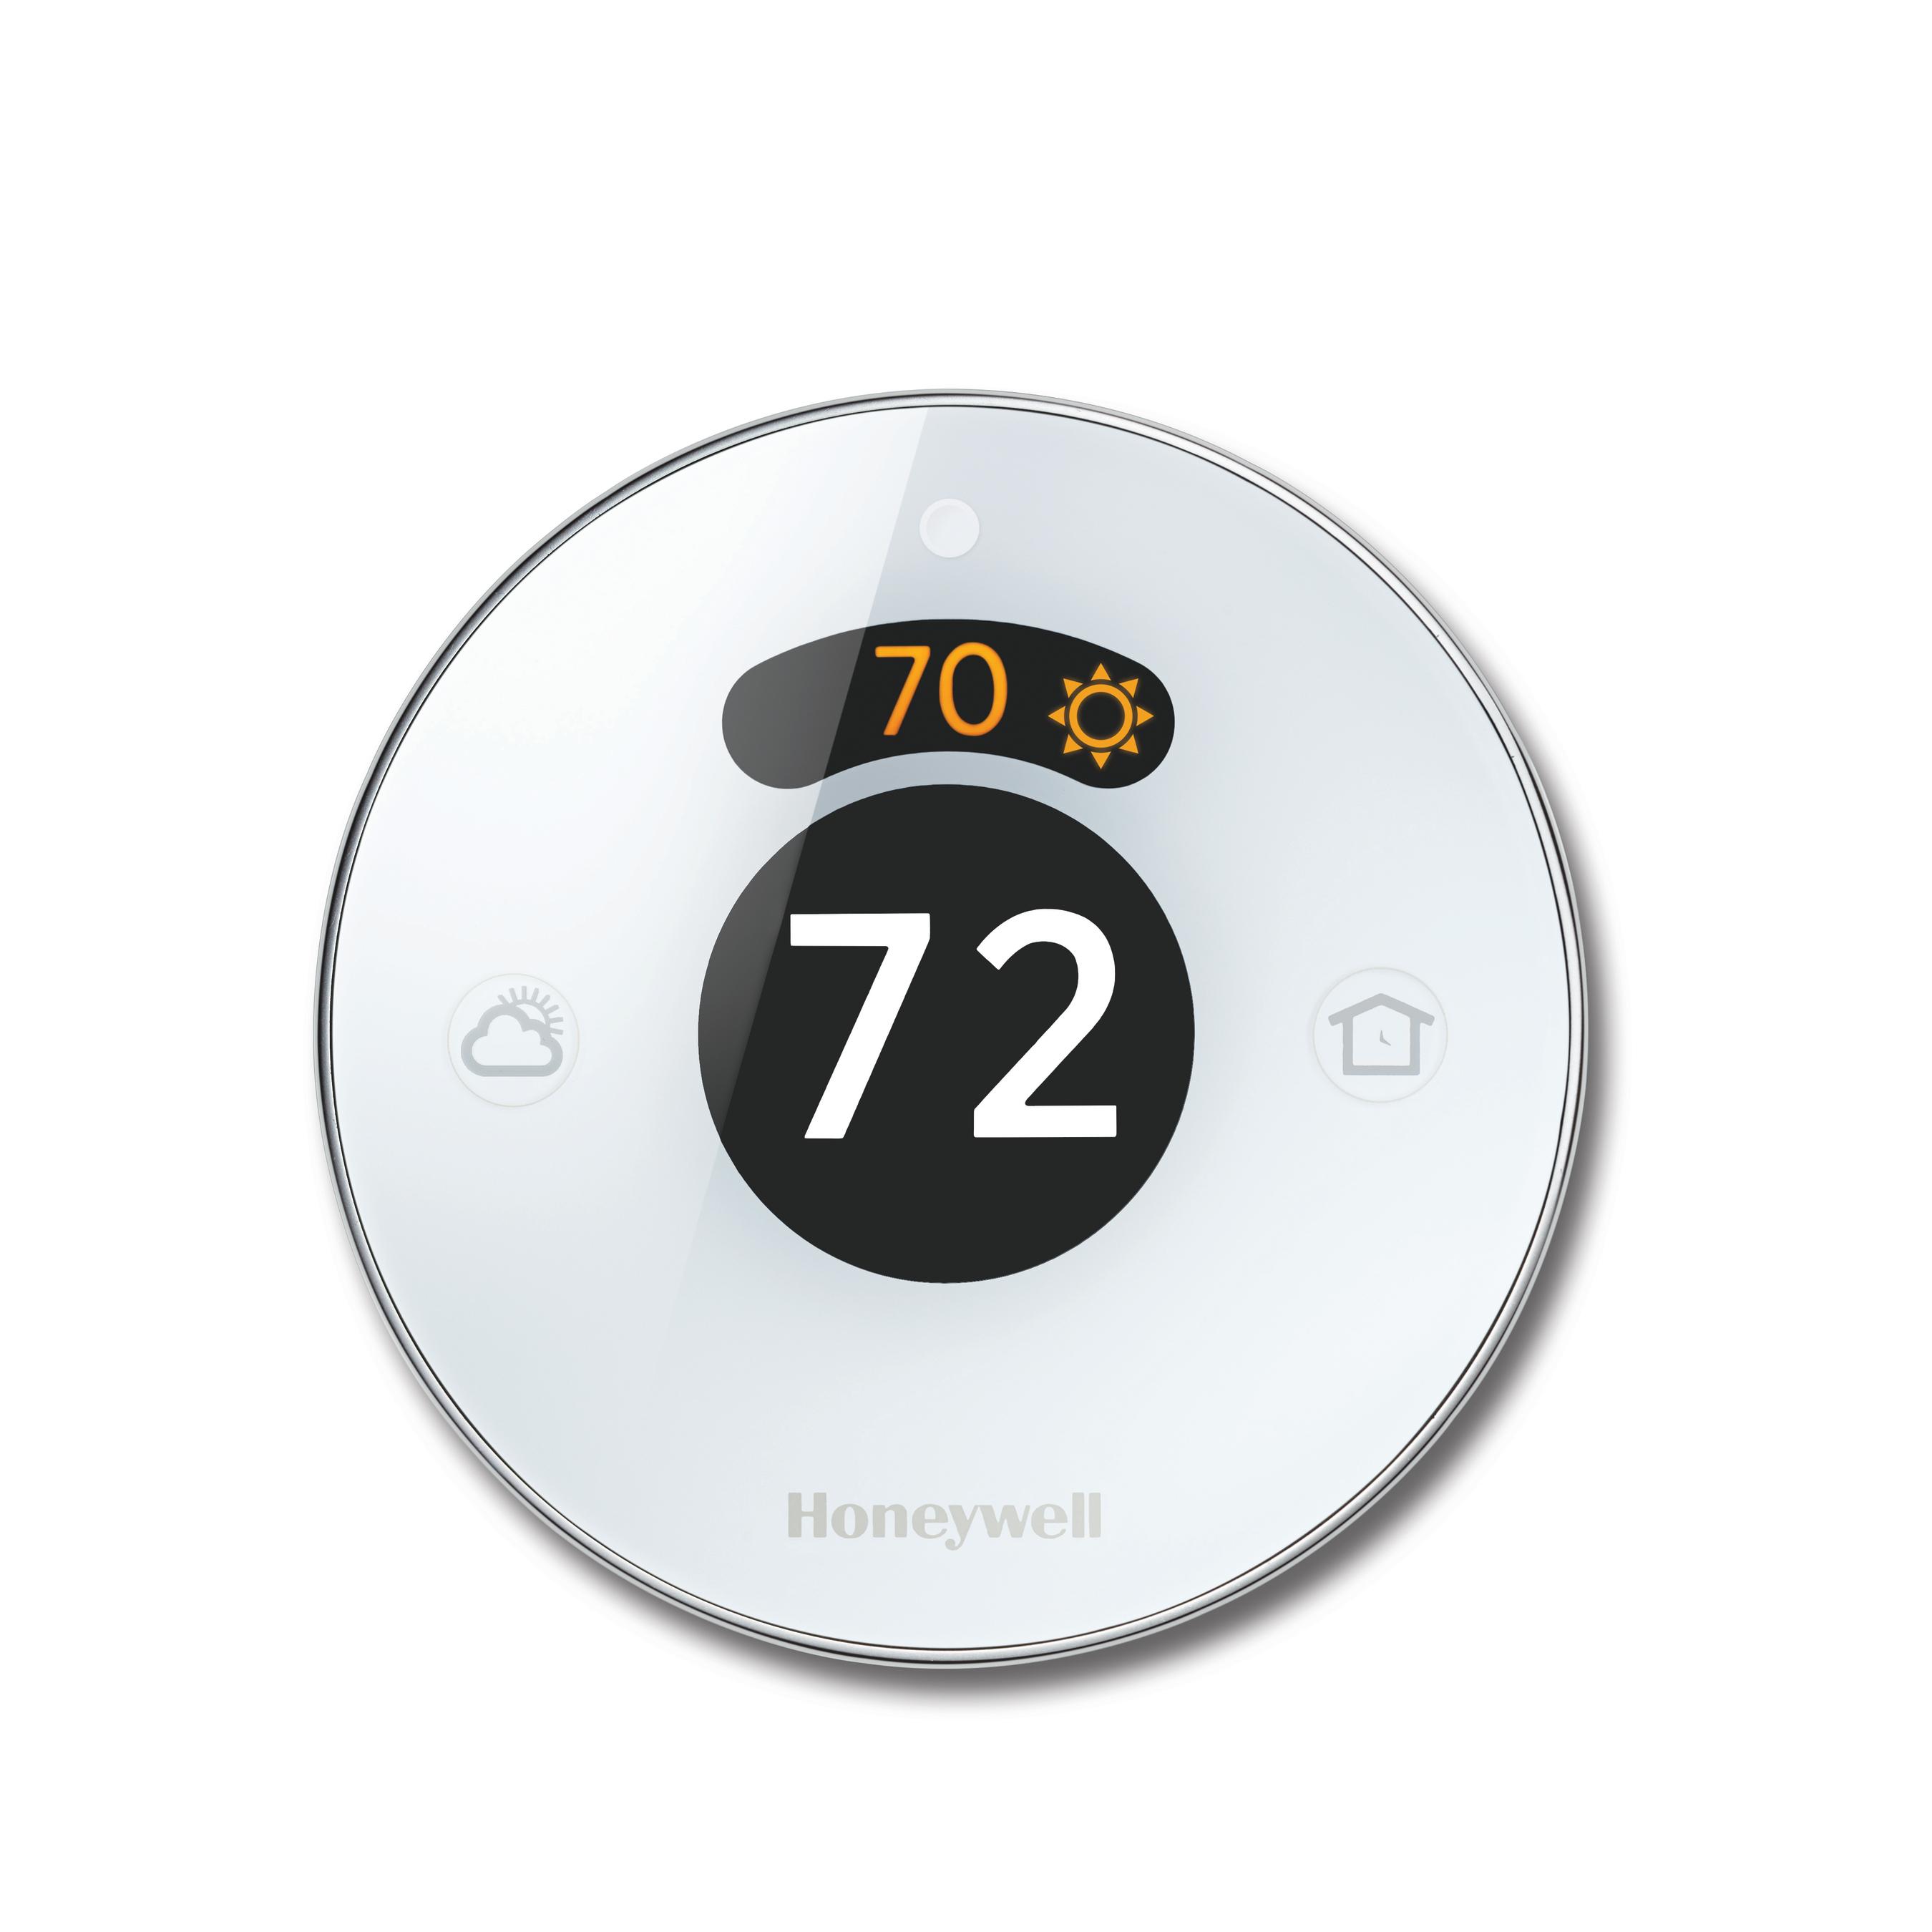 Honeywell's new, second generation Lyric Round Wi-Fi Thermostat